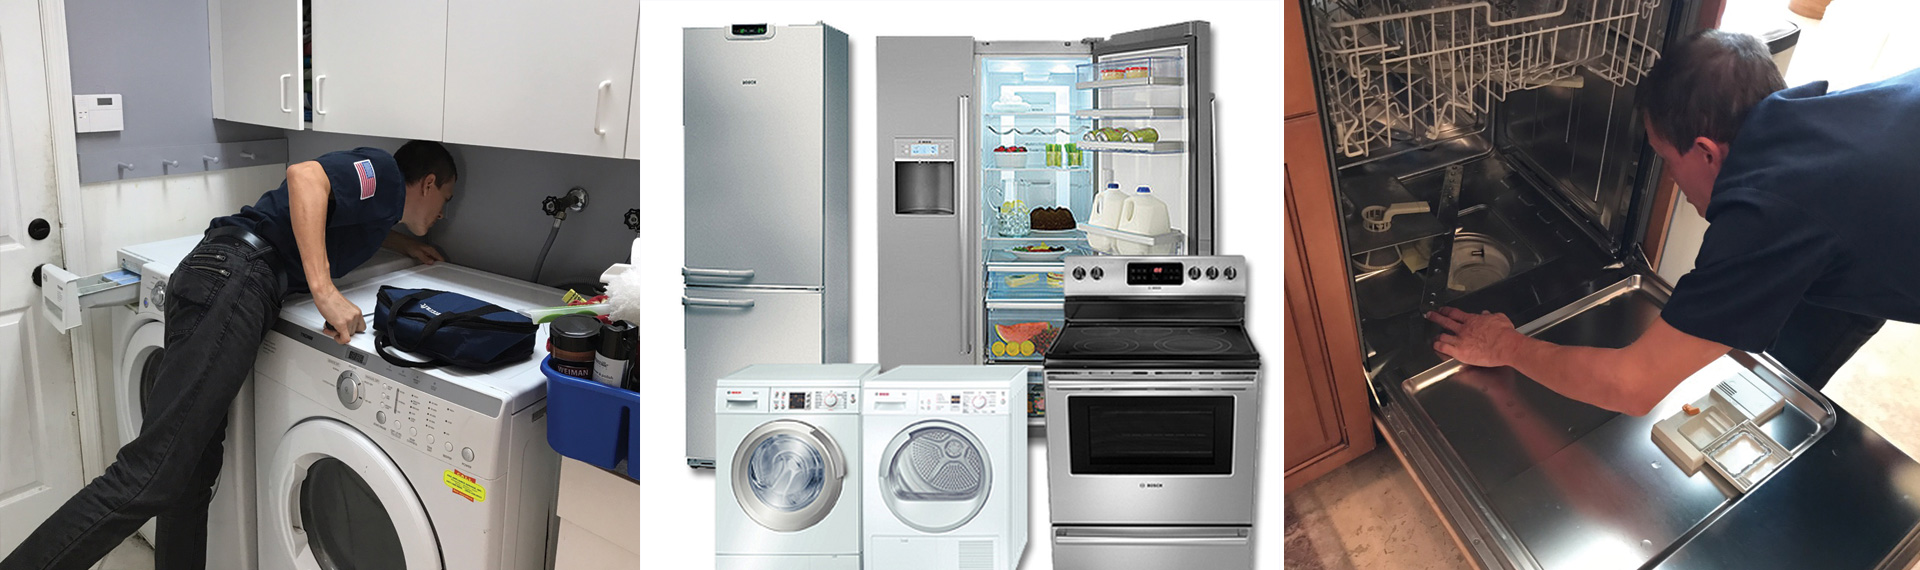 1A Appliance Service Oakland Park FL